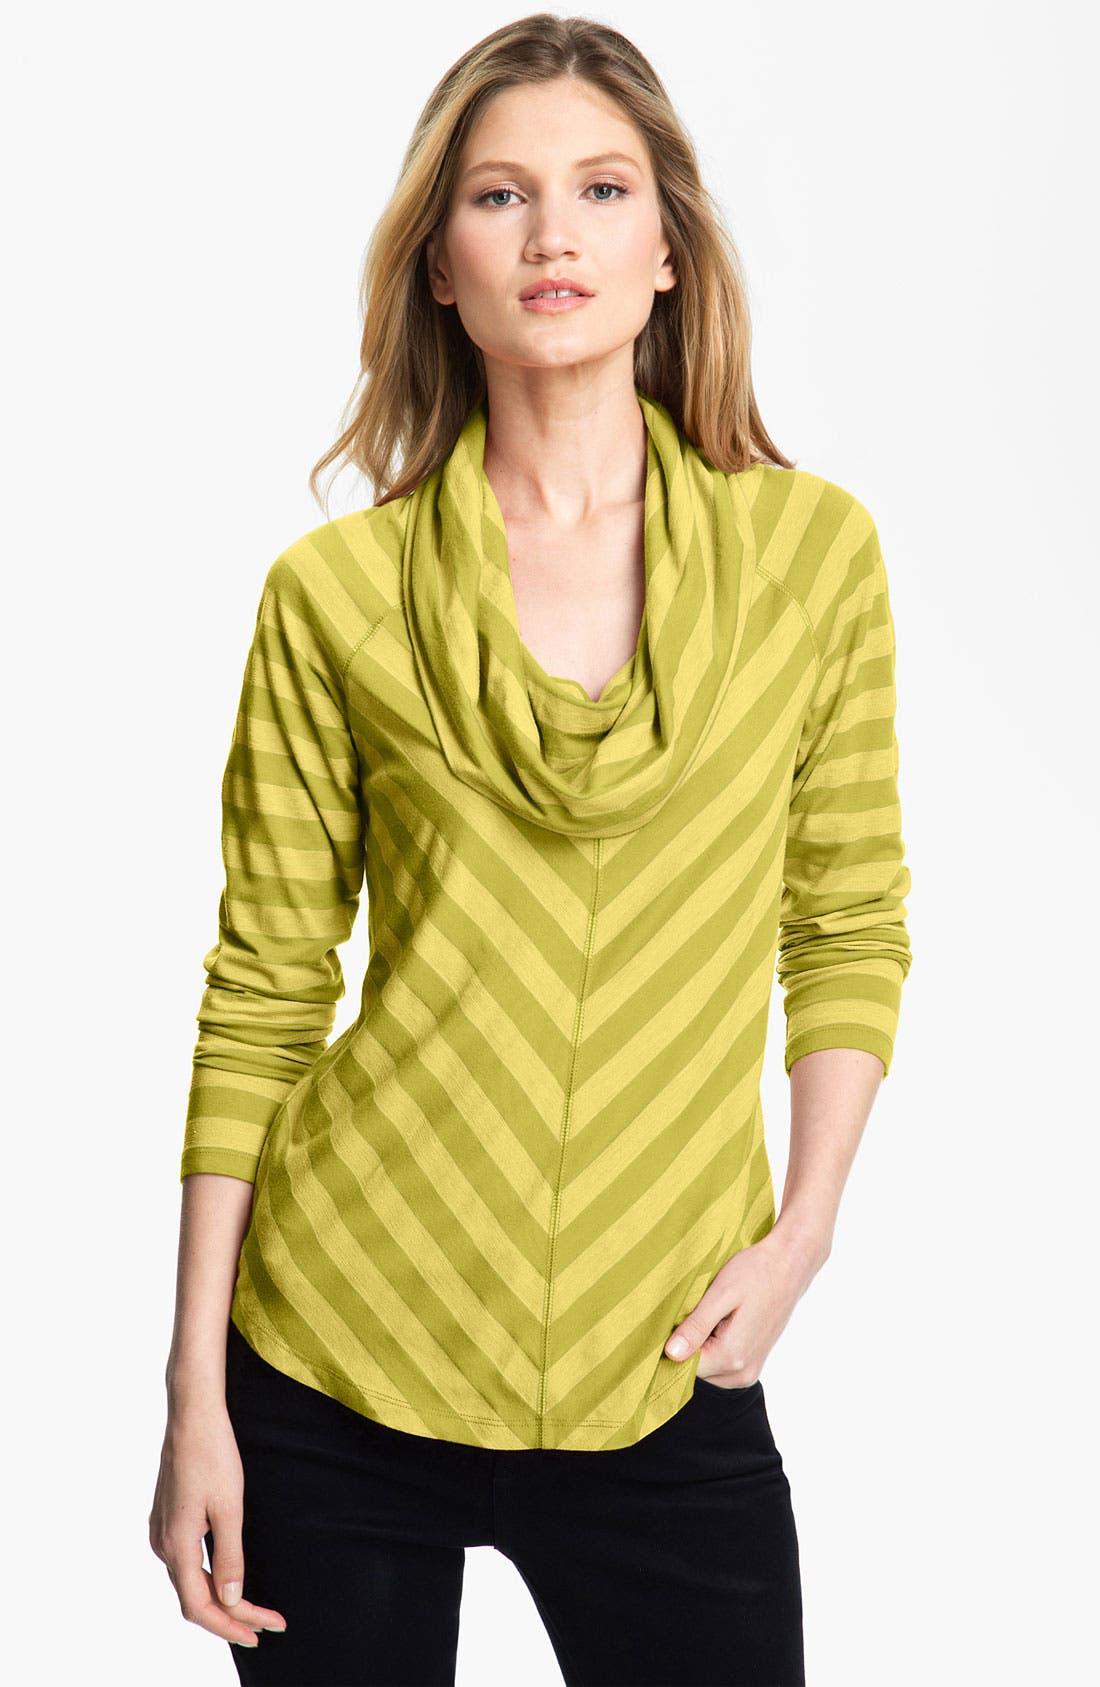 Alternate Image 1 Selected - Amber Sun Slub Stretch Knit Top